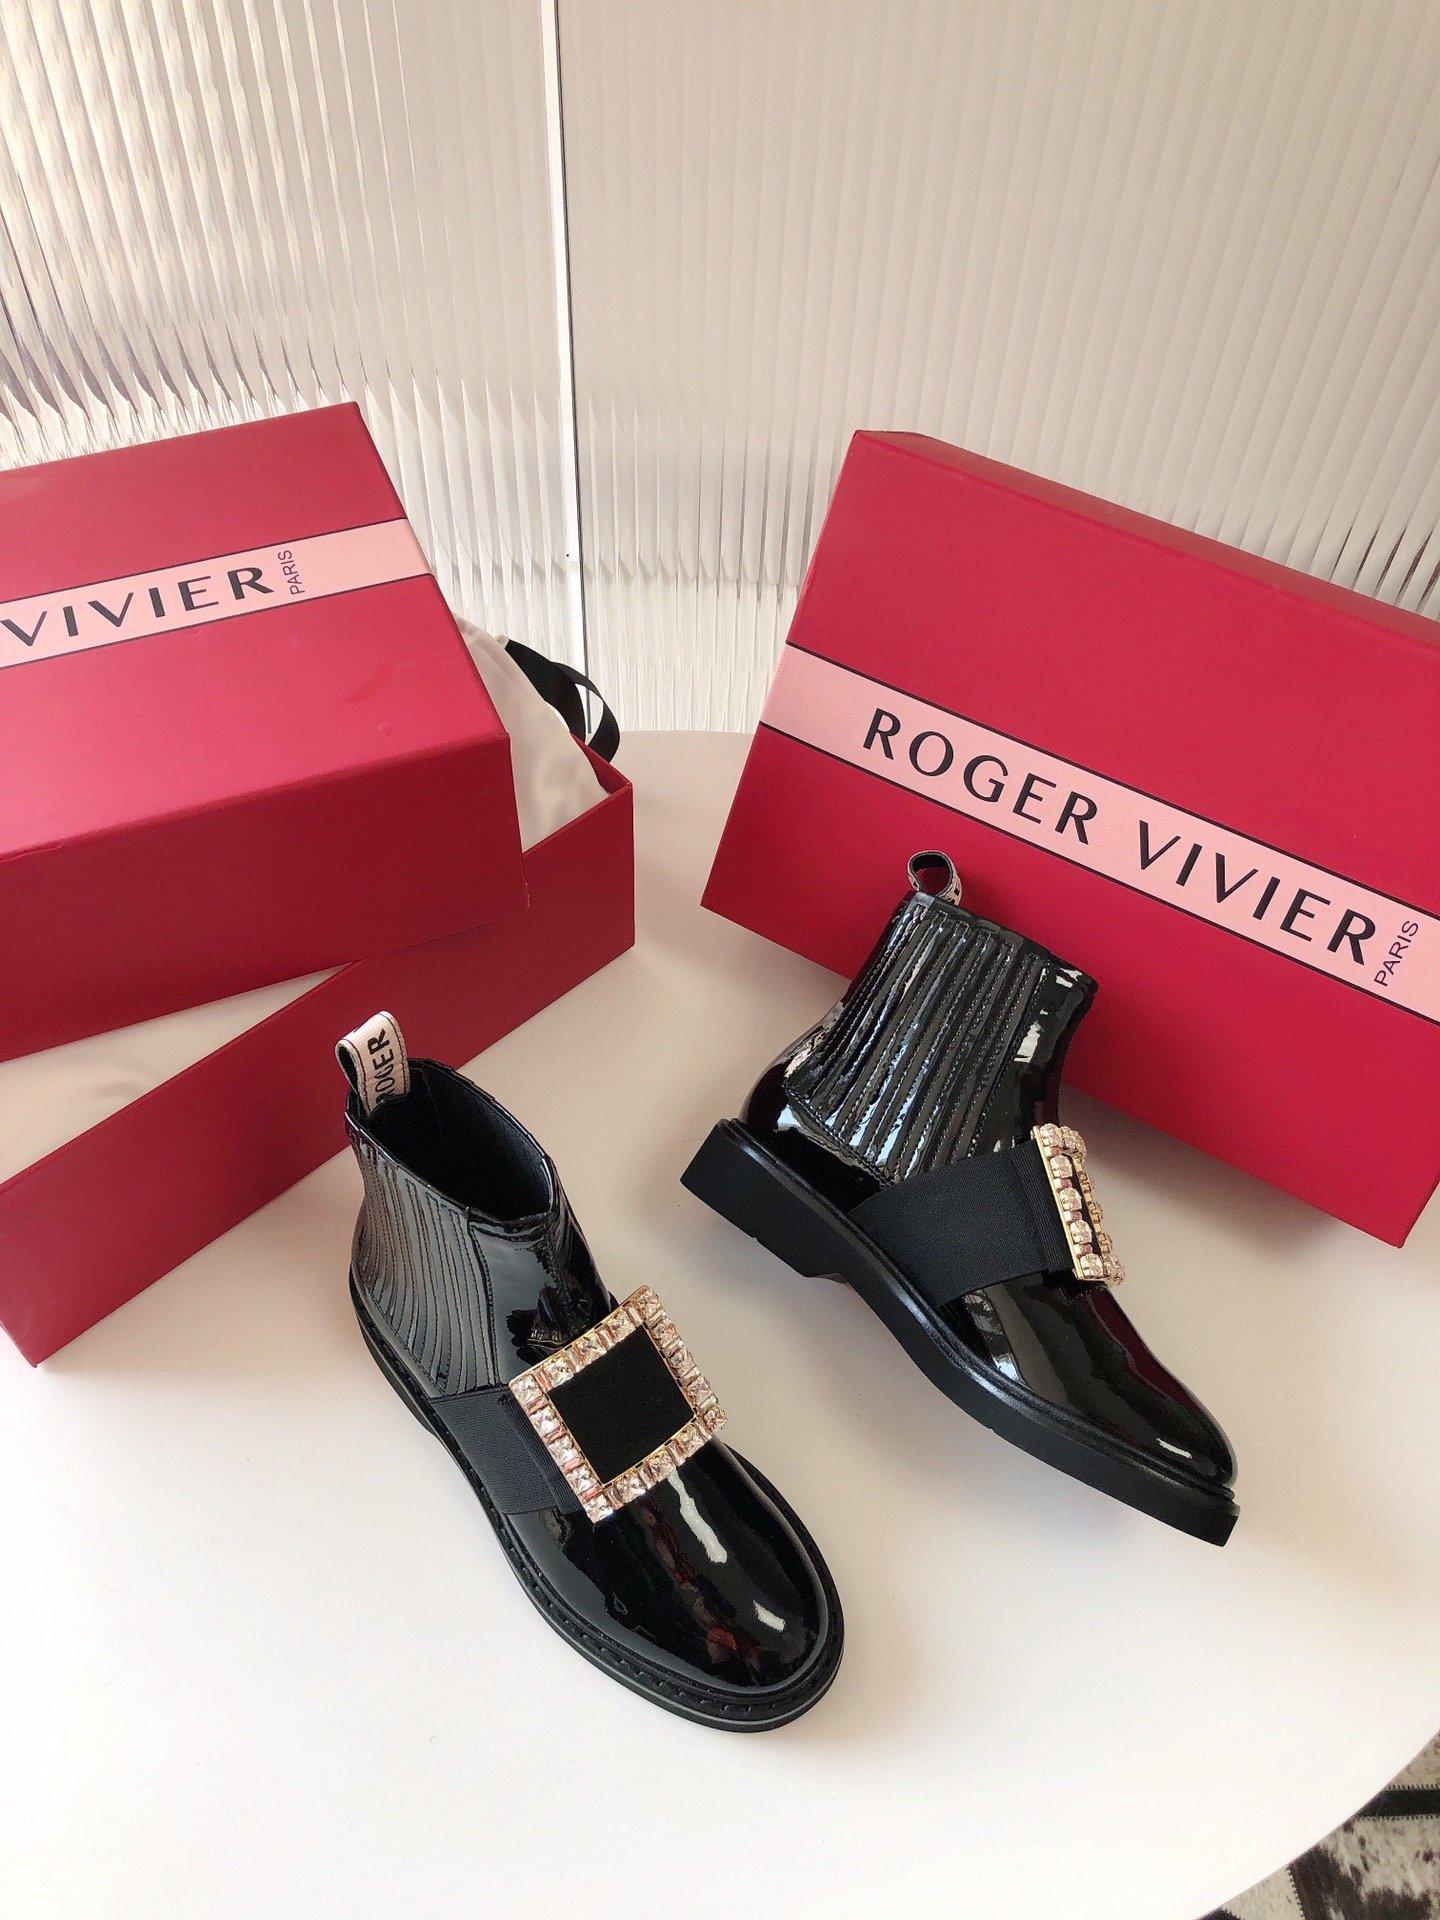 Roger Vivier 切尔西短靴 钻扣/钻扣(图2)